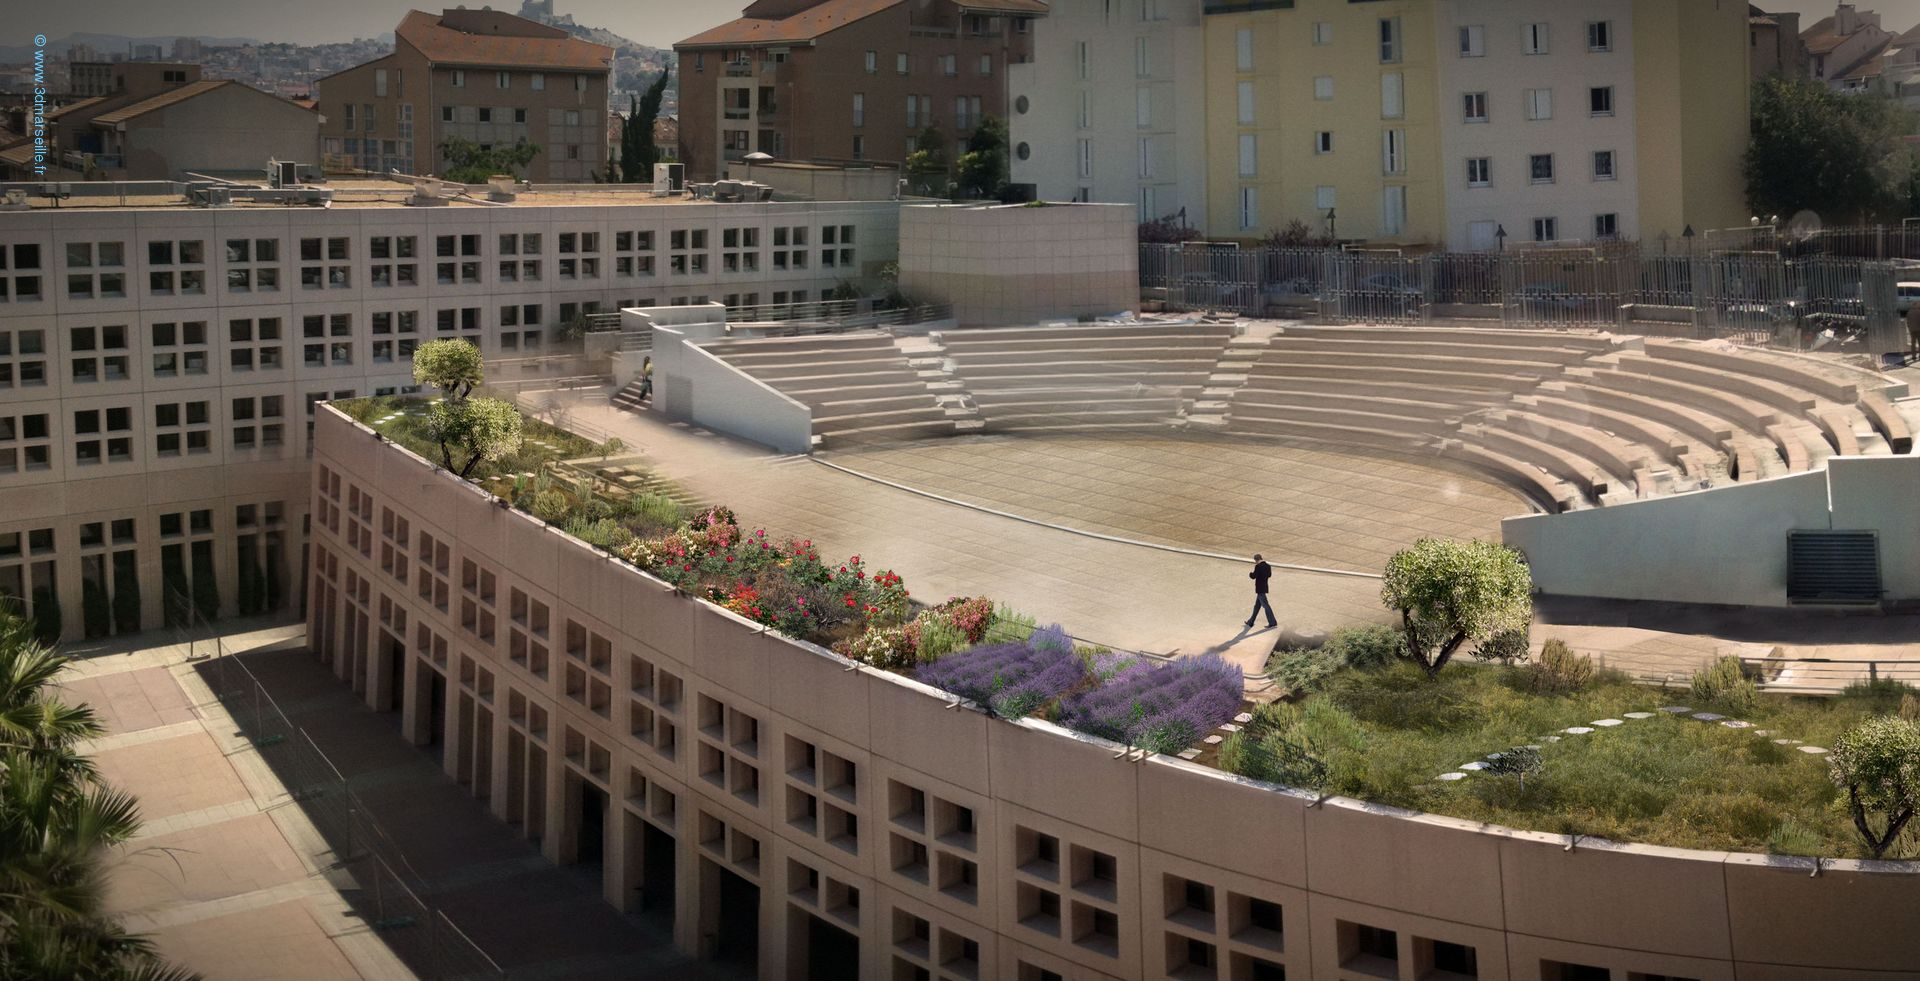 Toits terrasses du conseil r gional 13 3d marseille for Toits terrasses marseille